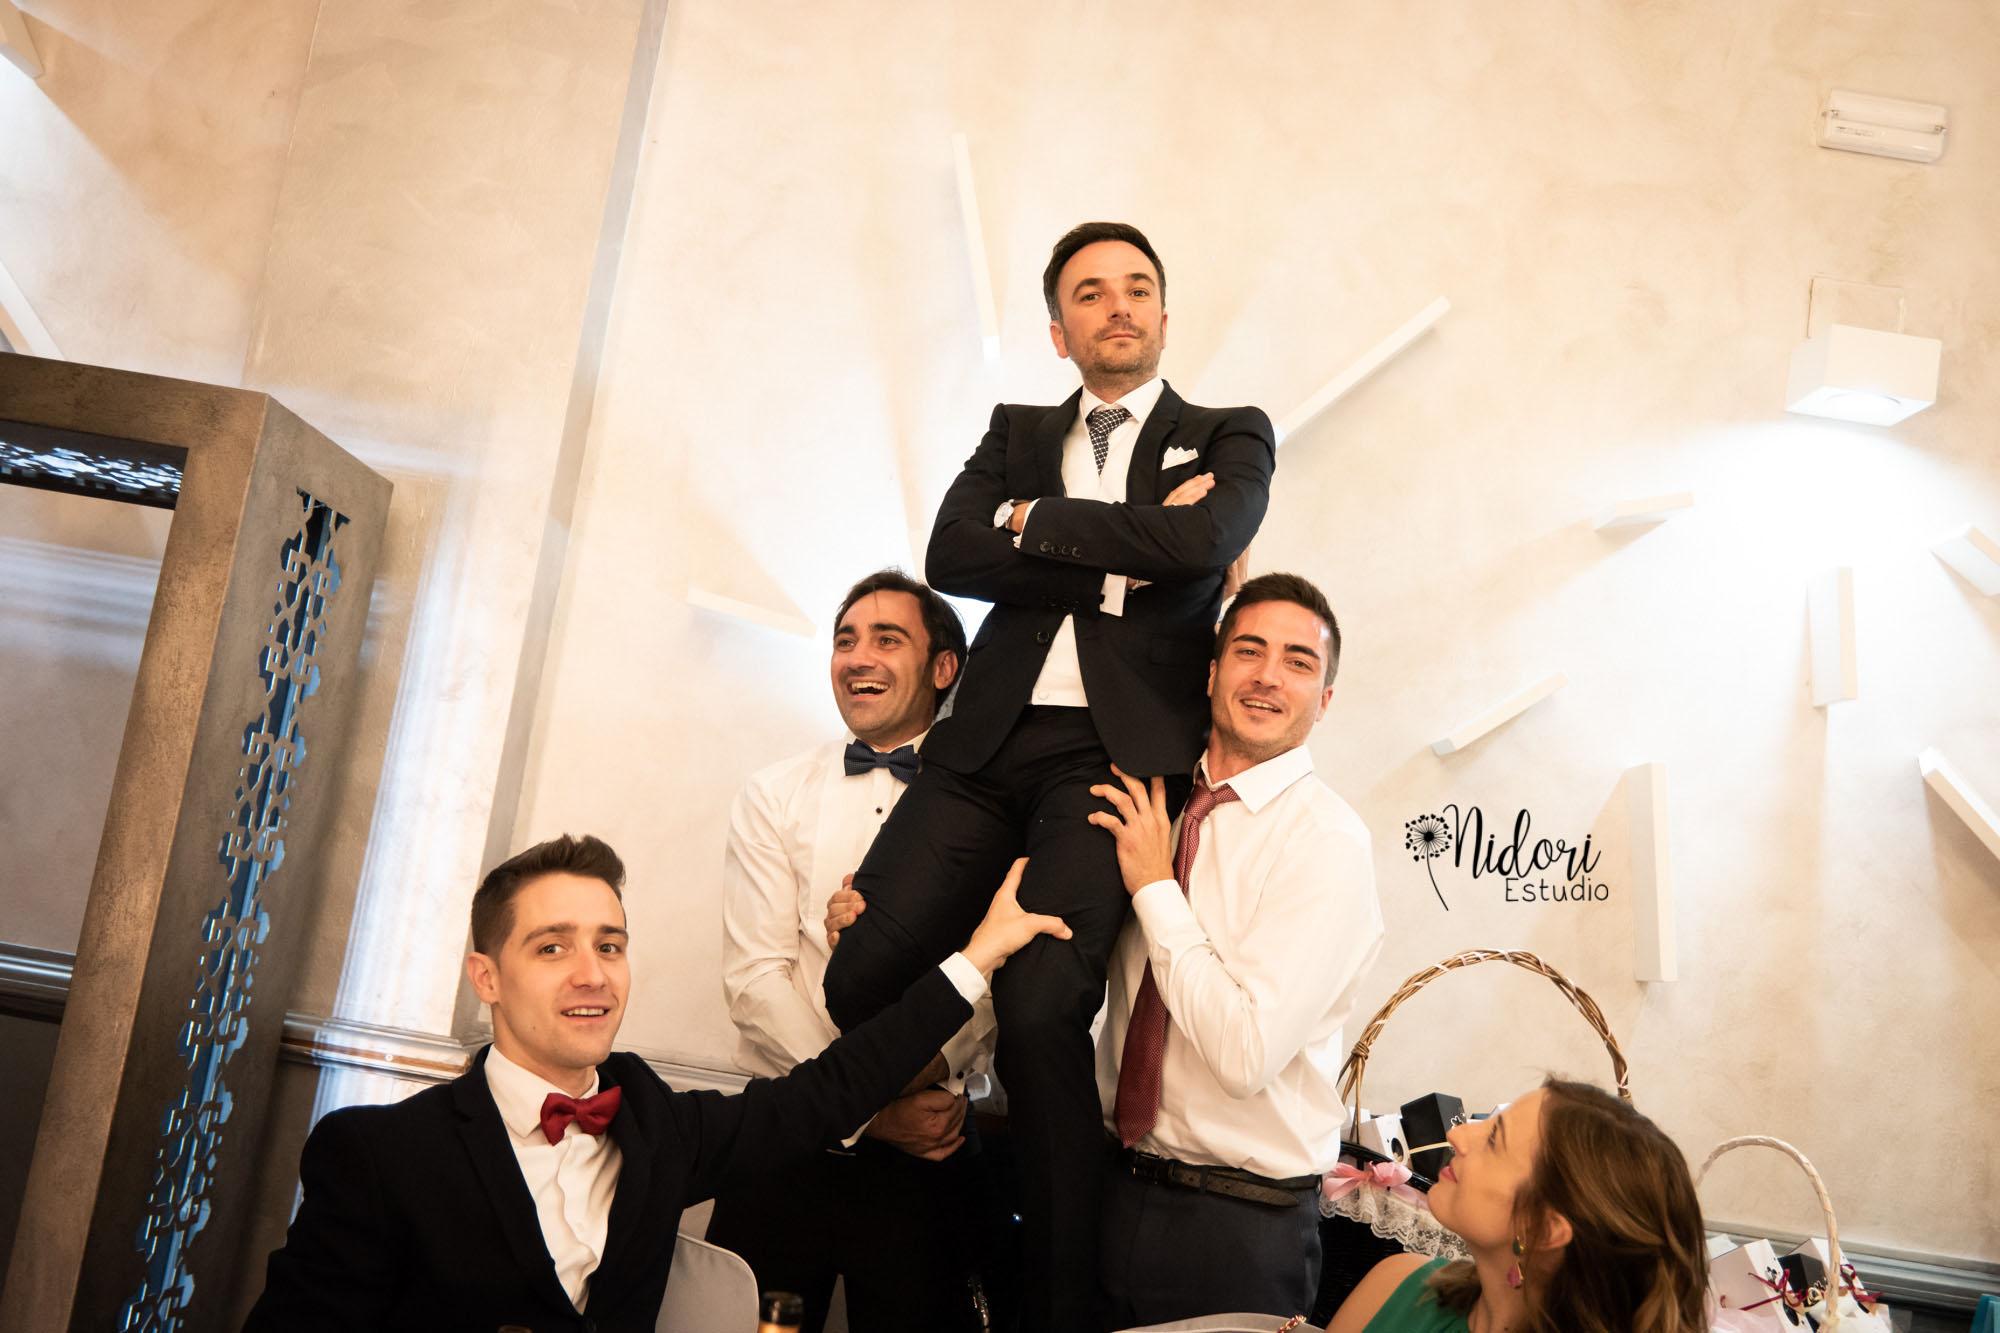 fotos-de-boda-reportaje-novios-fotografia-boda-nidoriestudio-fotos-valencia-almazora-castellon-españa-spain-045